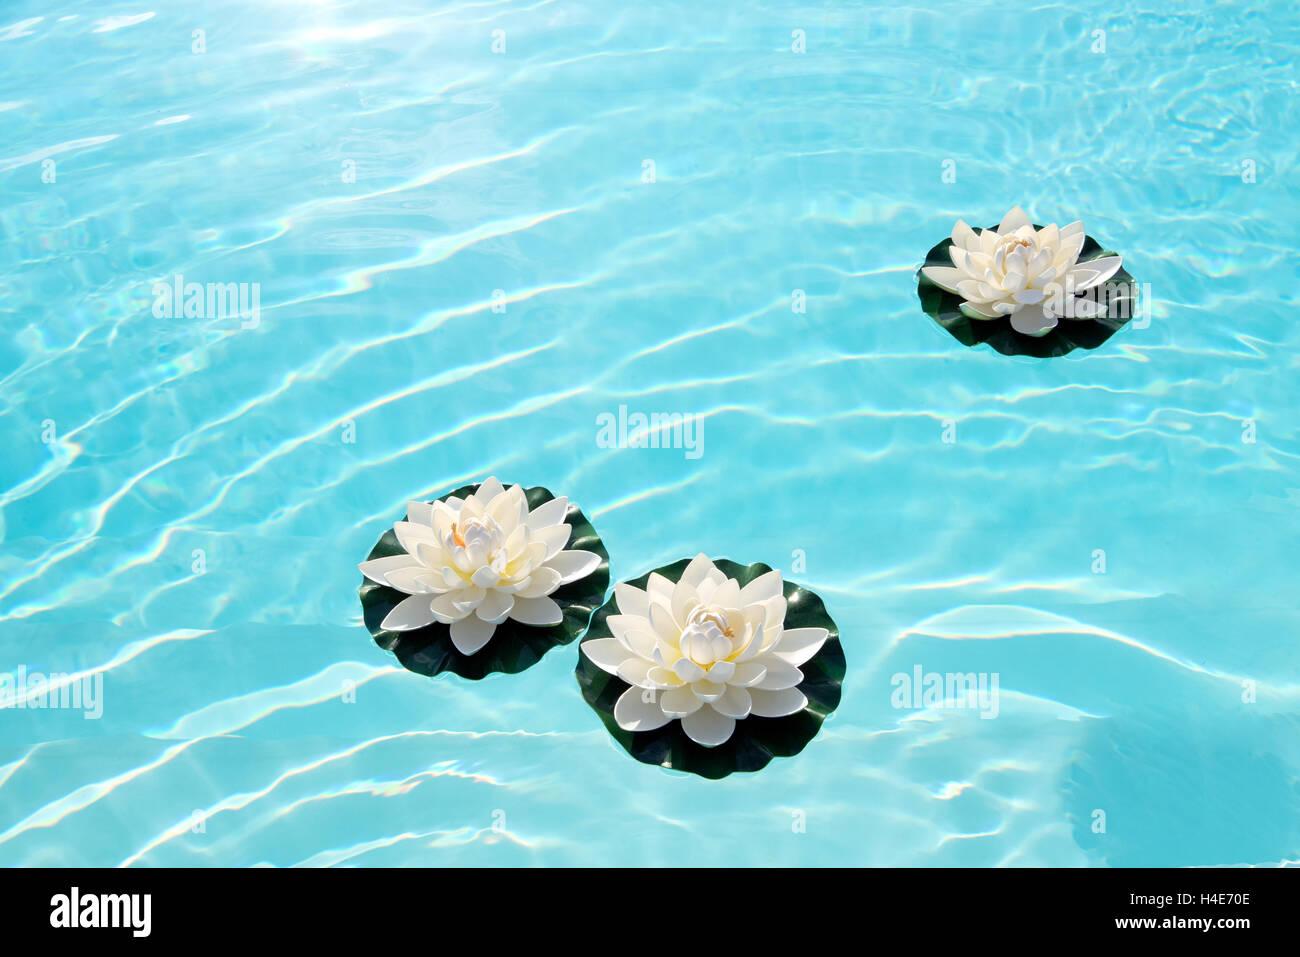 Floating Lotus Flowers Stock Photos Floating Lotus Flowers Stock